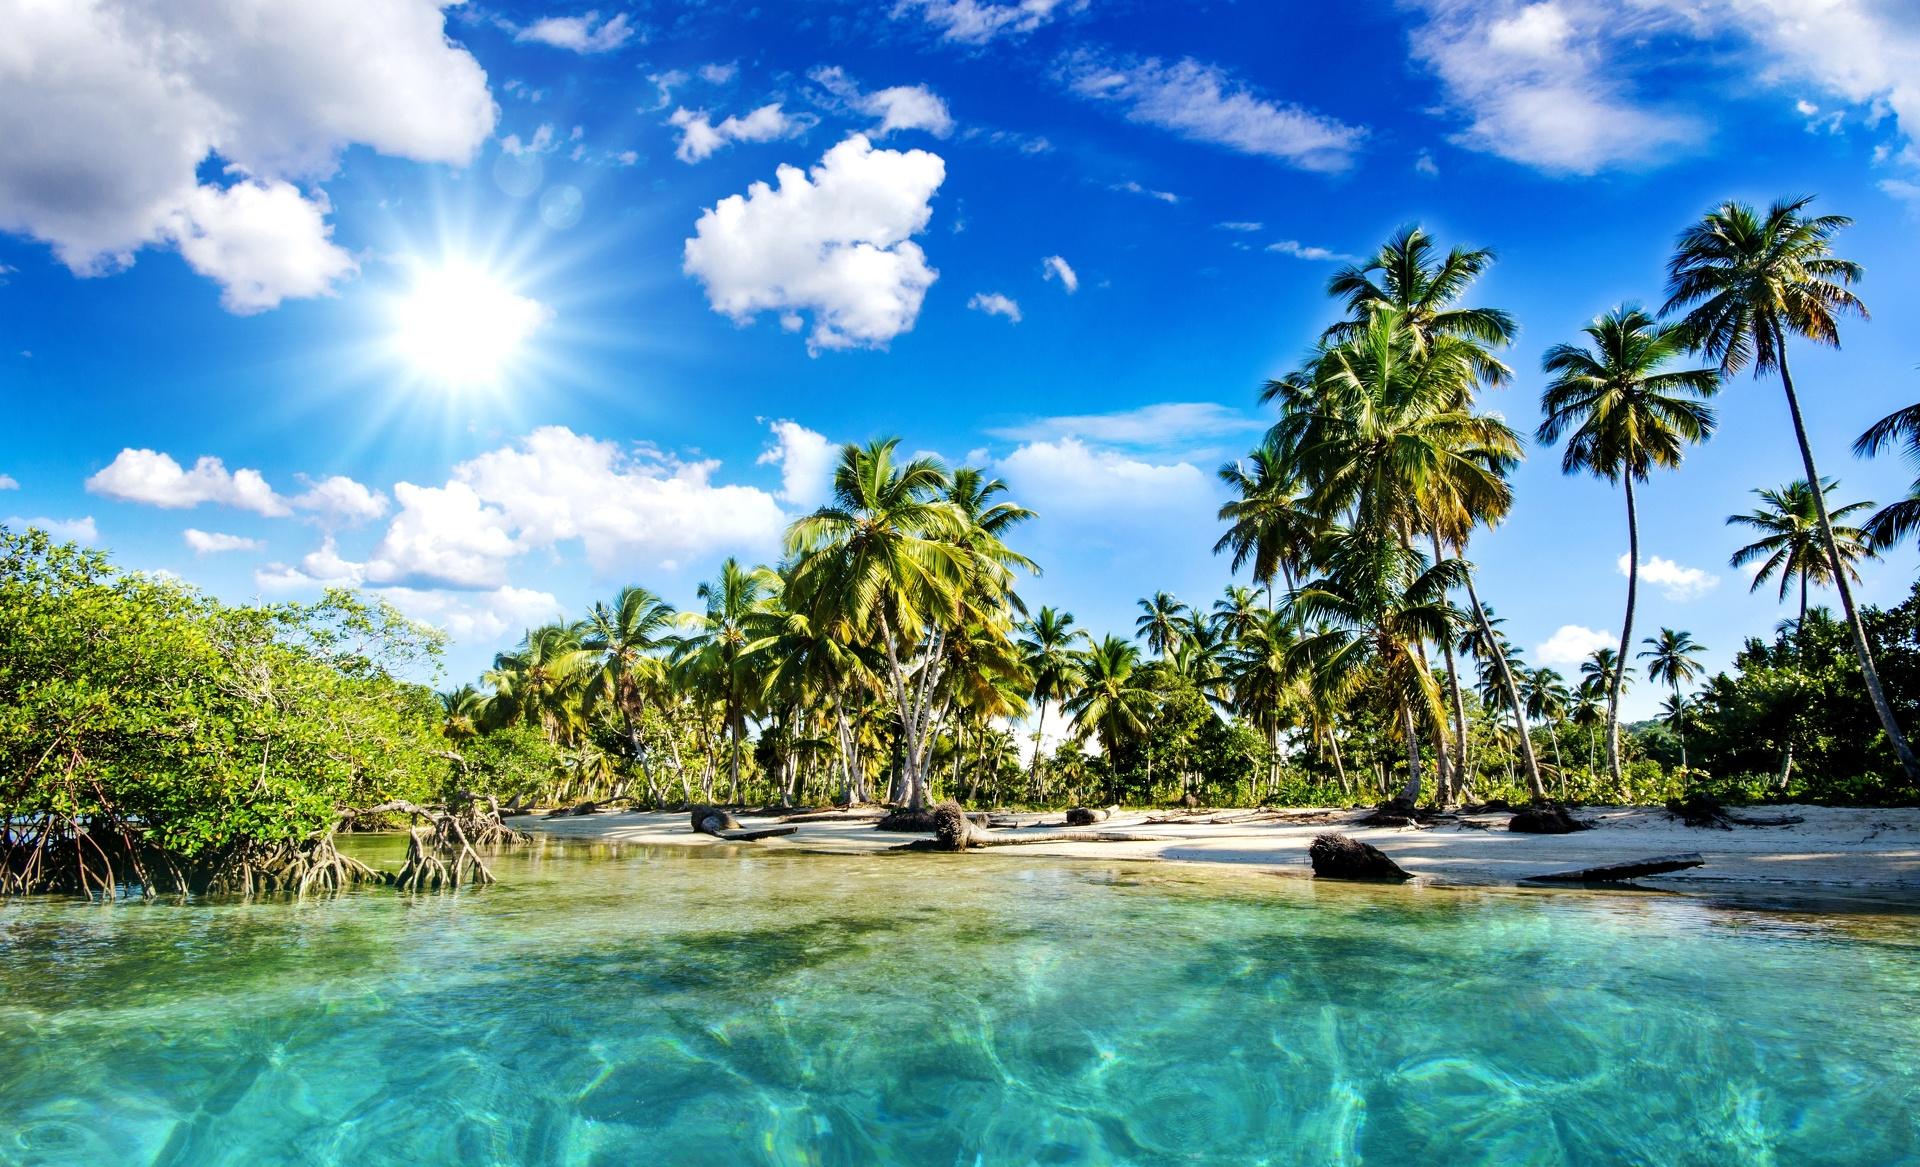 Magnifique plage - Wallpaper - Fond d'écran HD